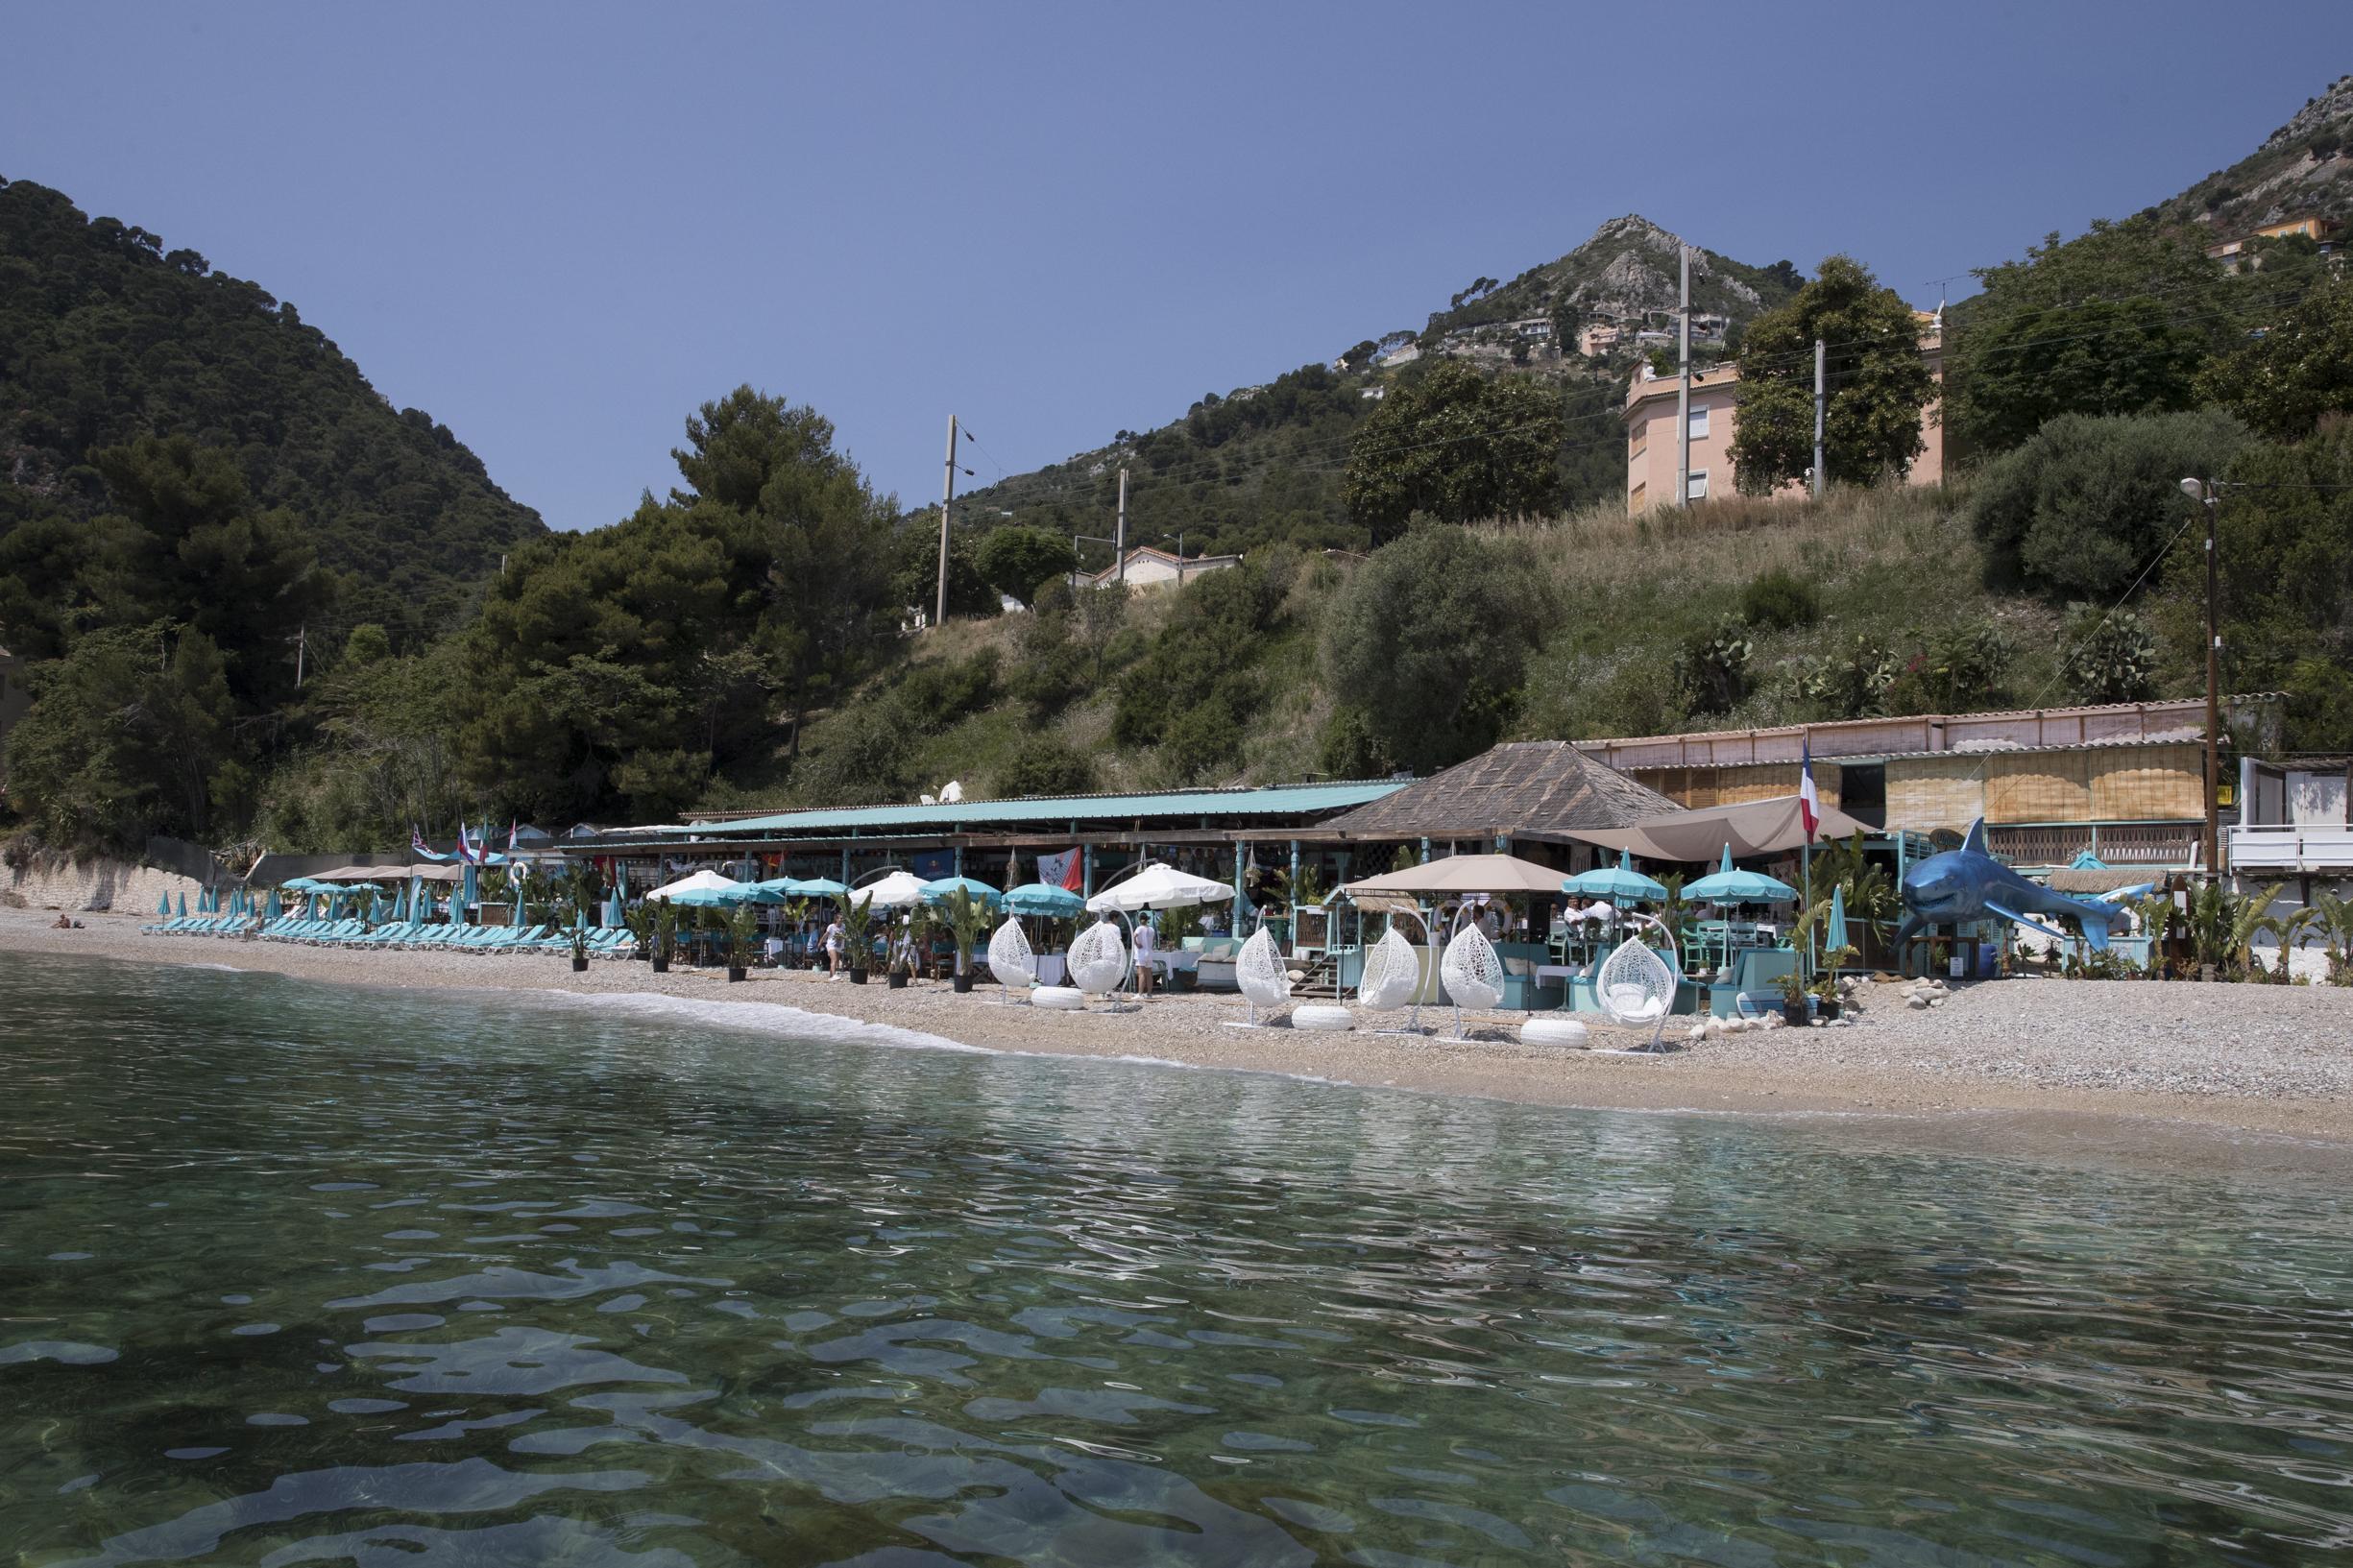 Anjuna, beach restaurant by the Mediterranean Sea.